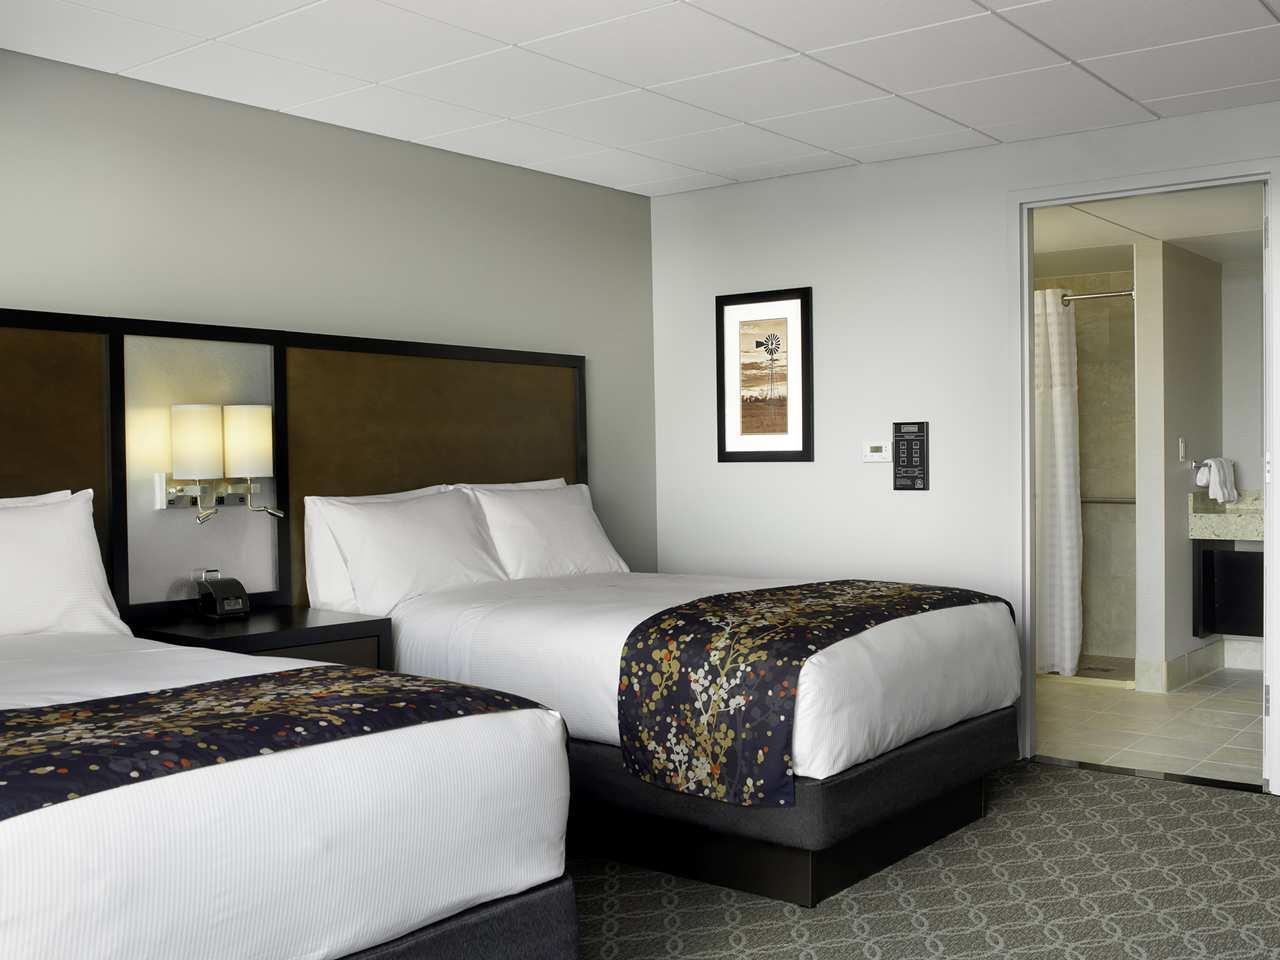 DoubleTree by Hilton Hotel Cedar Rapids Convention Complex image 8